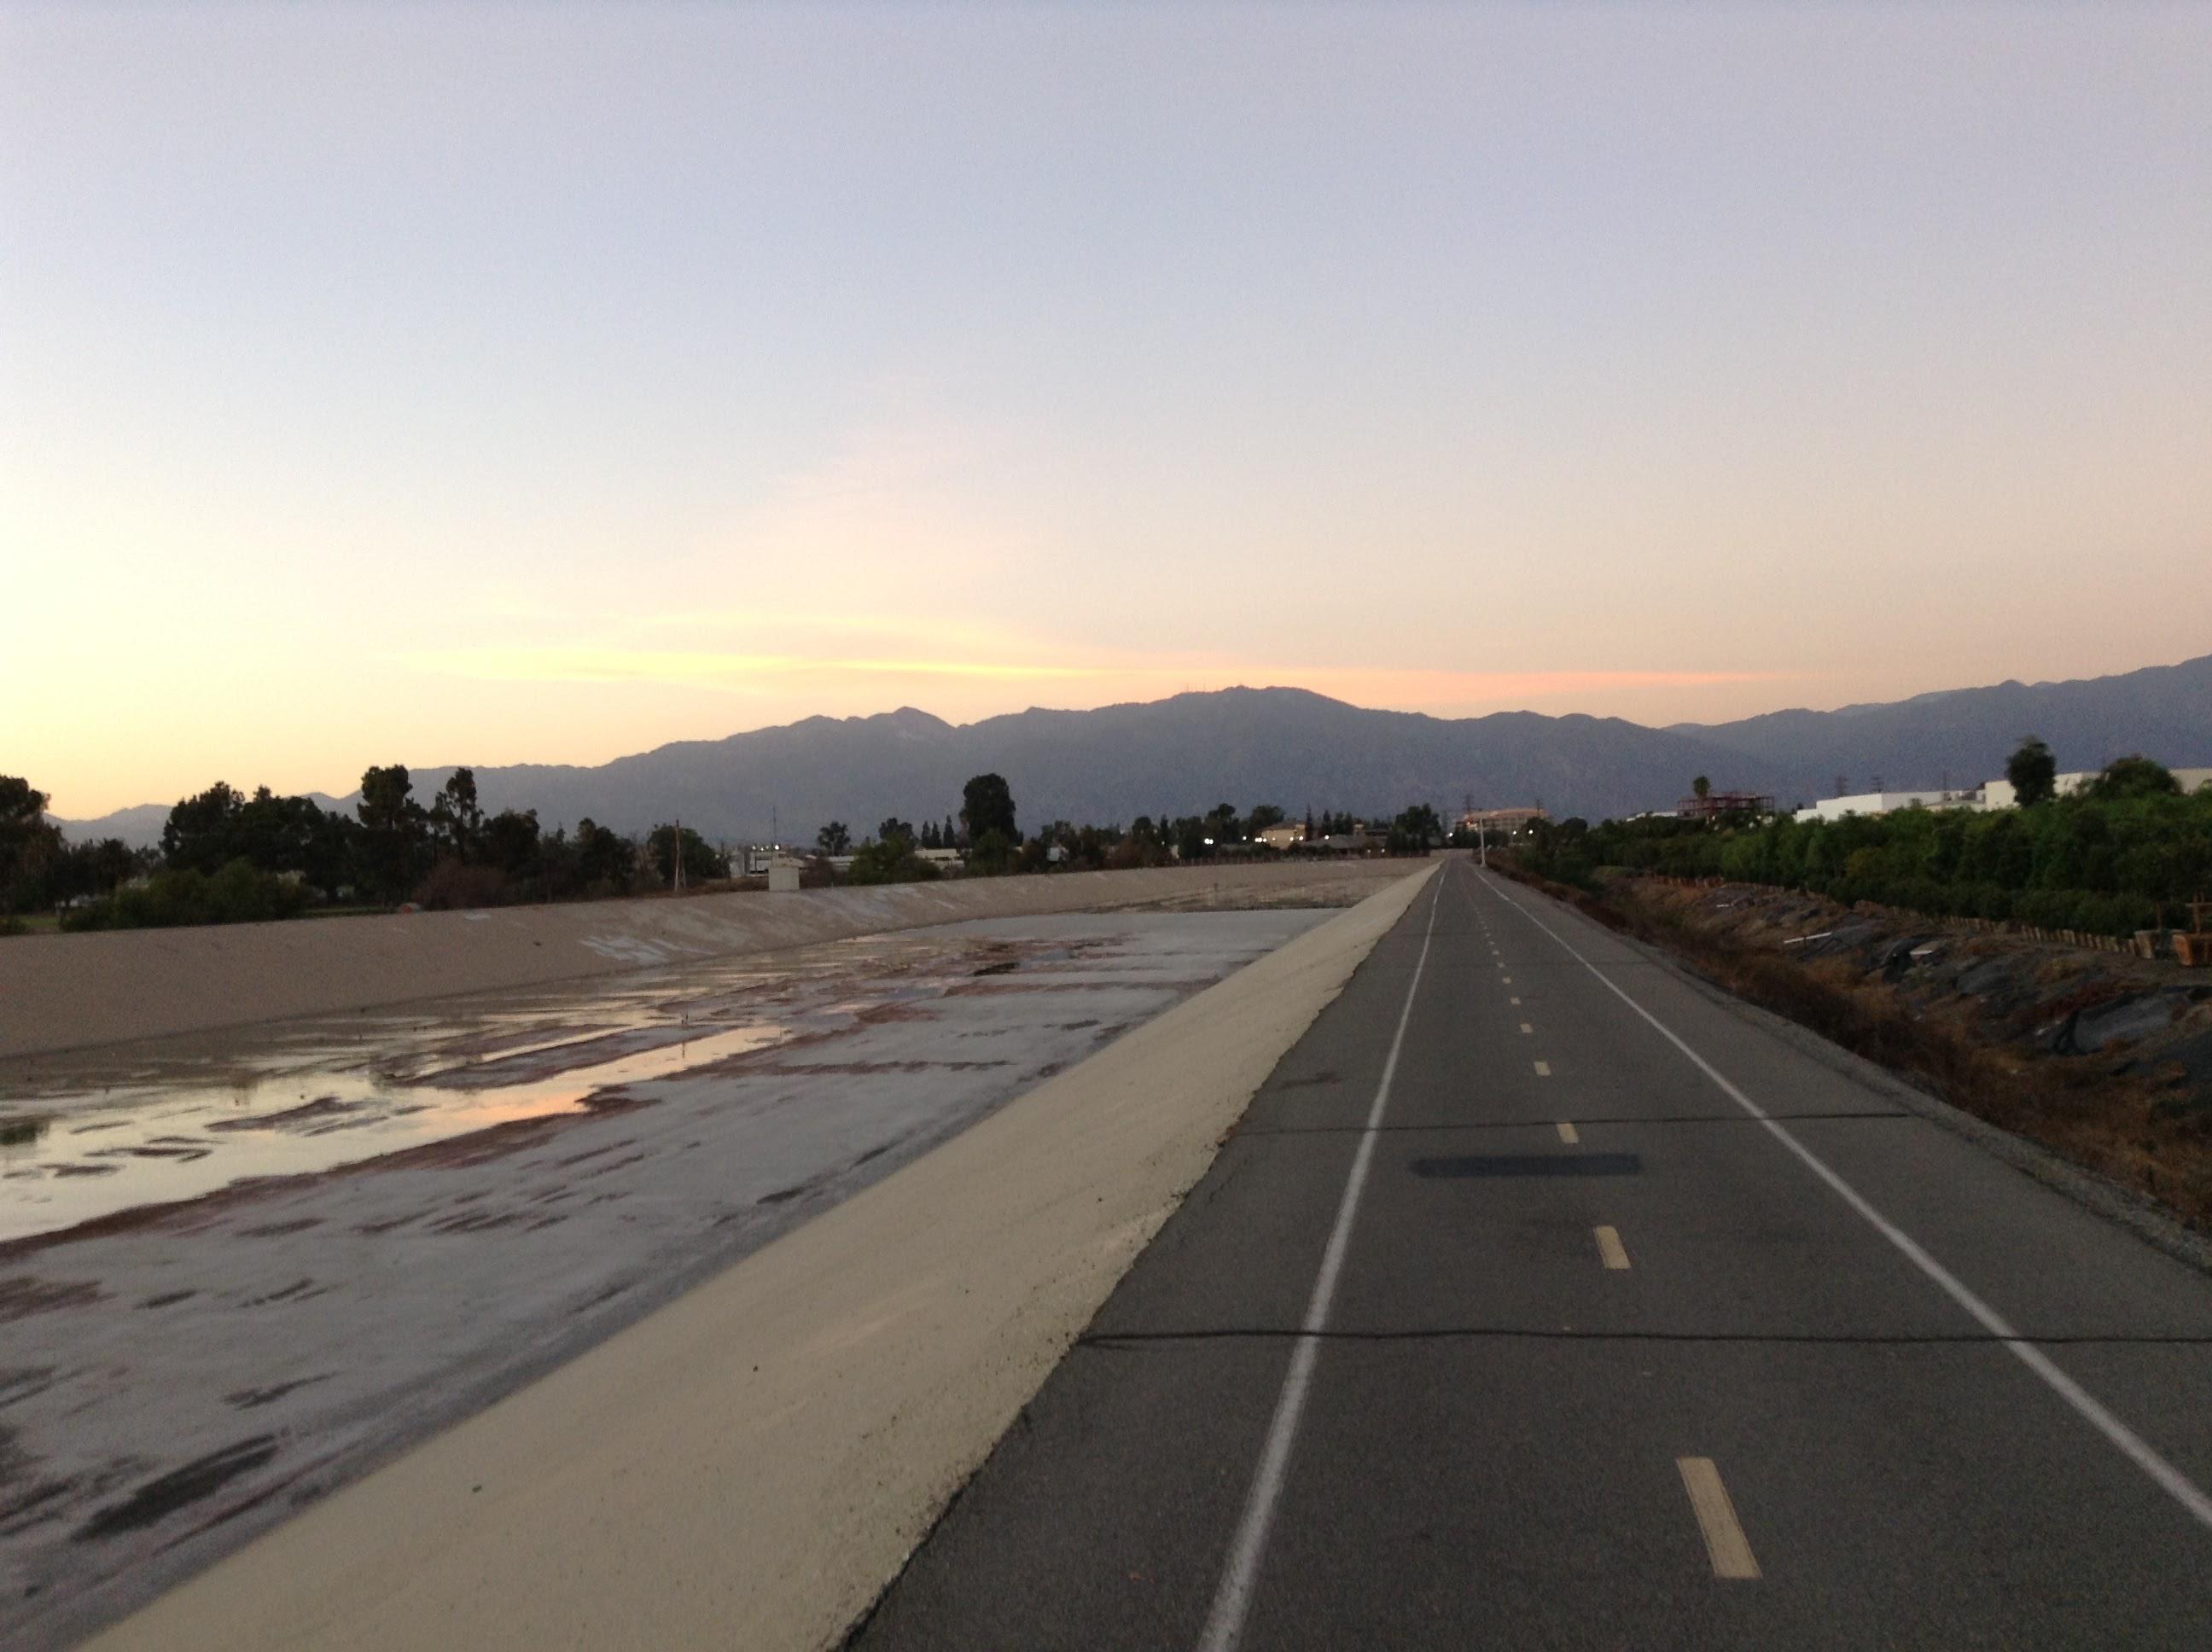 Bike path along San Gabriel River / flood control canal